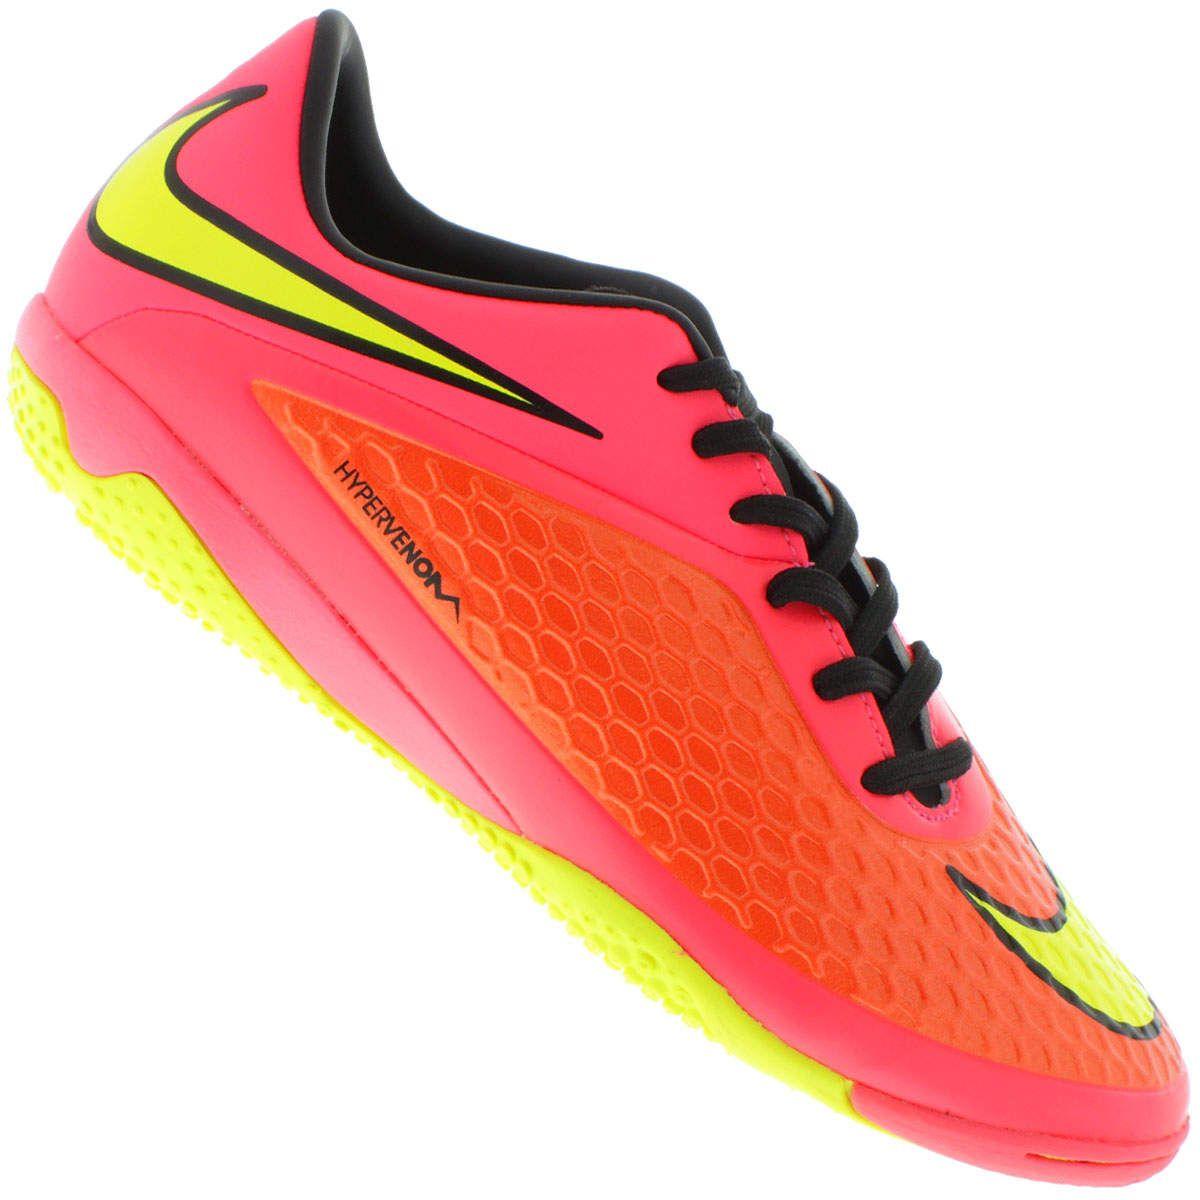 Centauro - Chuteira de Futsal Nike Hypervenom Phelon IC  bdae71cfa17d7